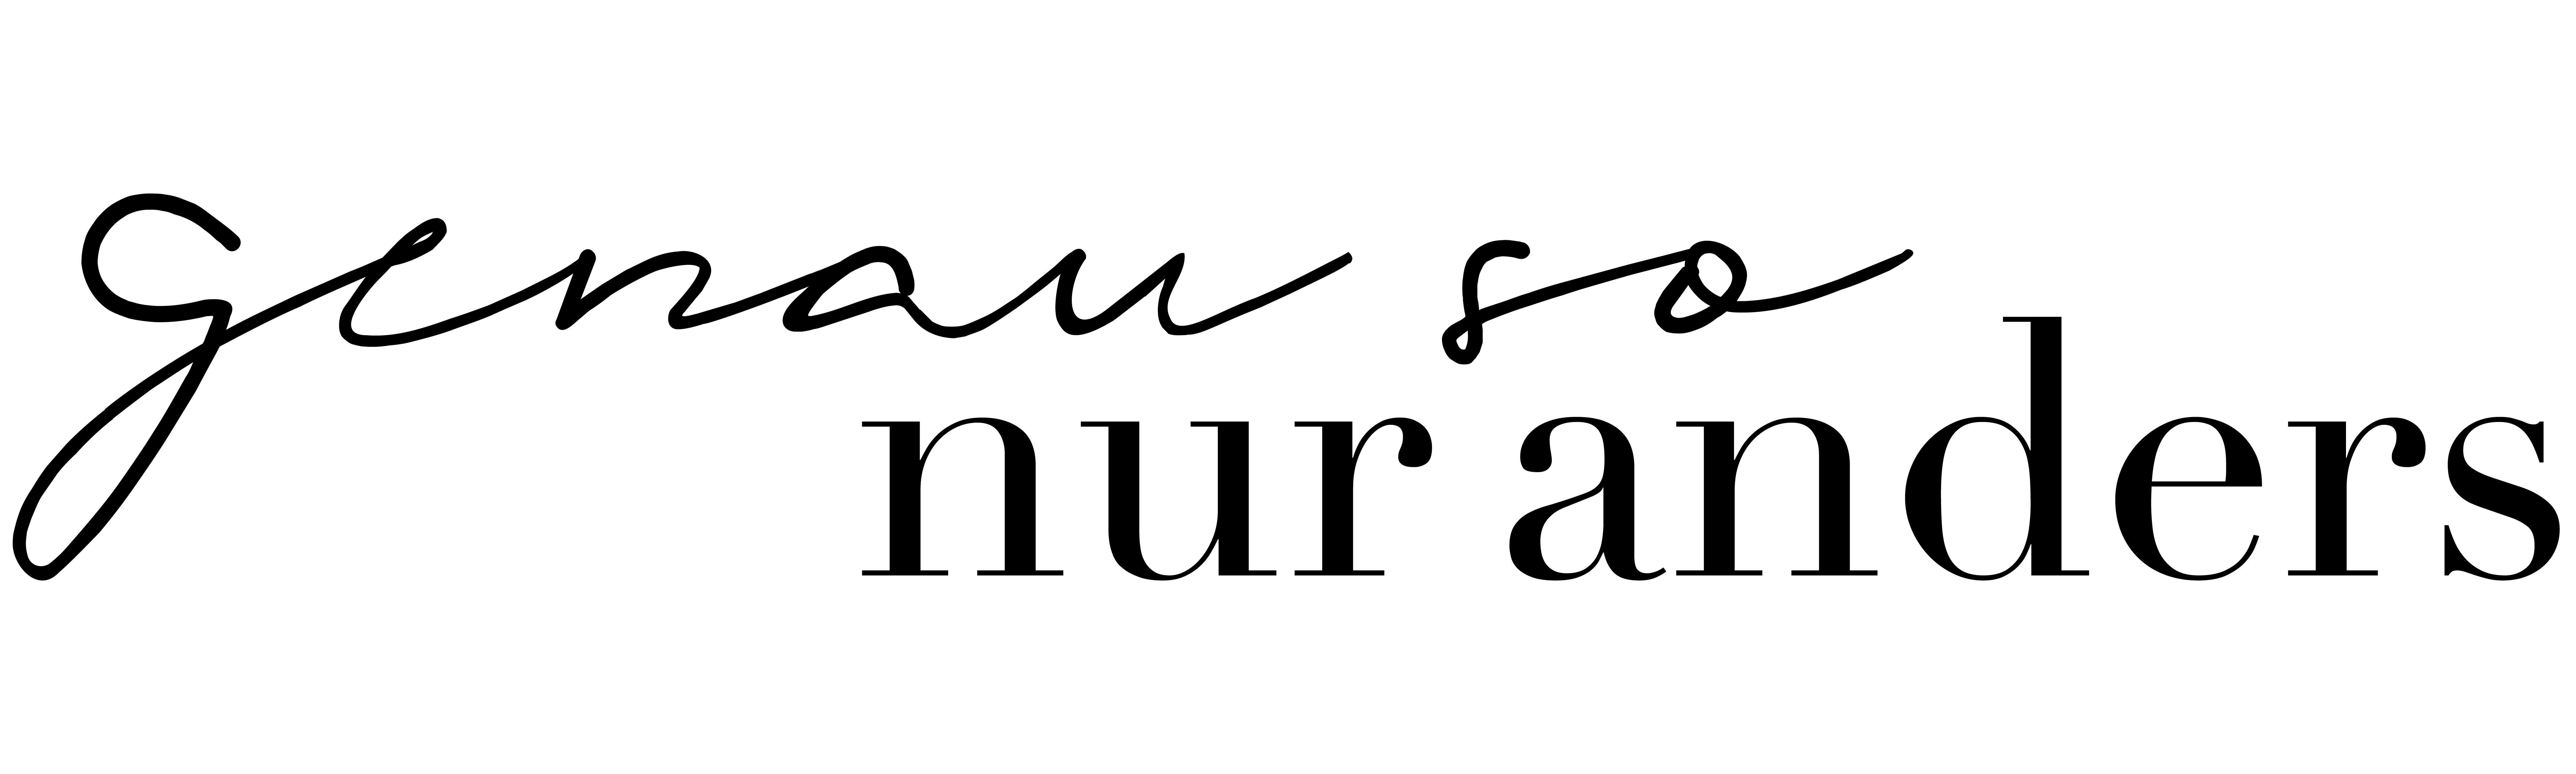 Blogger / Graphic Designer